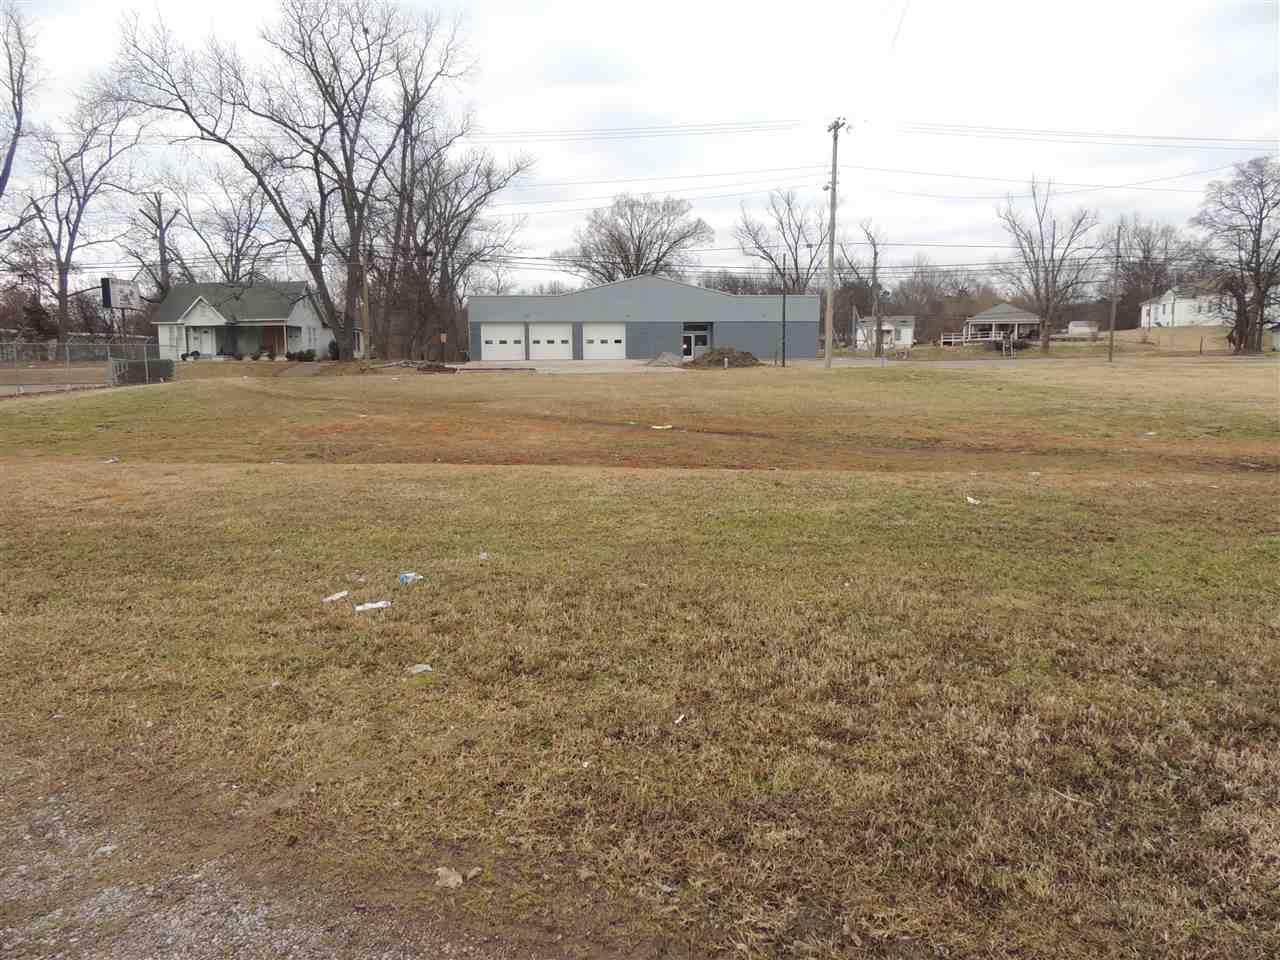 Forrest St,Dyersburg,Tennessee 38024,Lots/land,Forrest St,181163